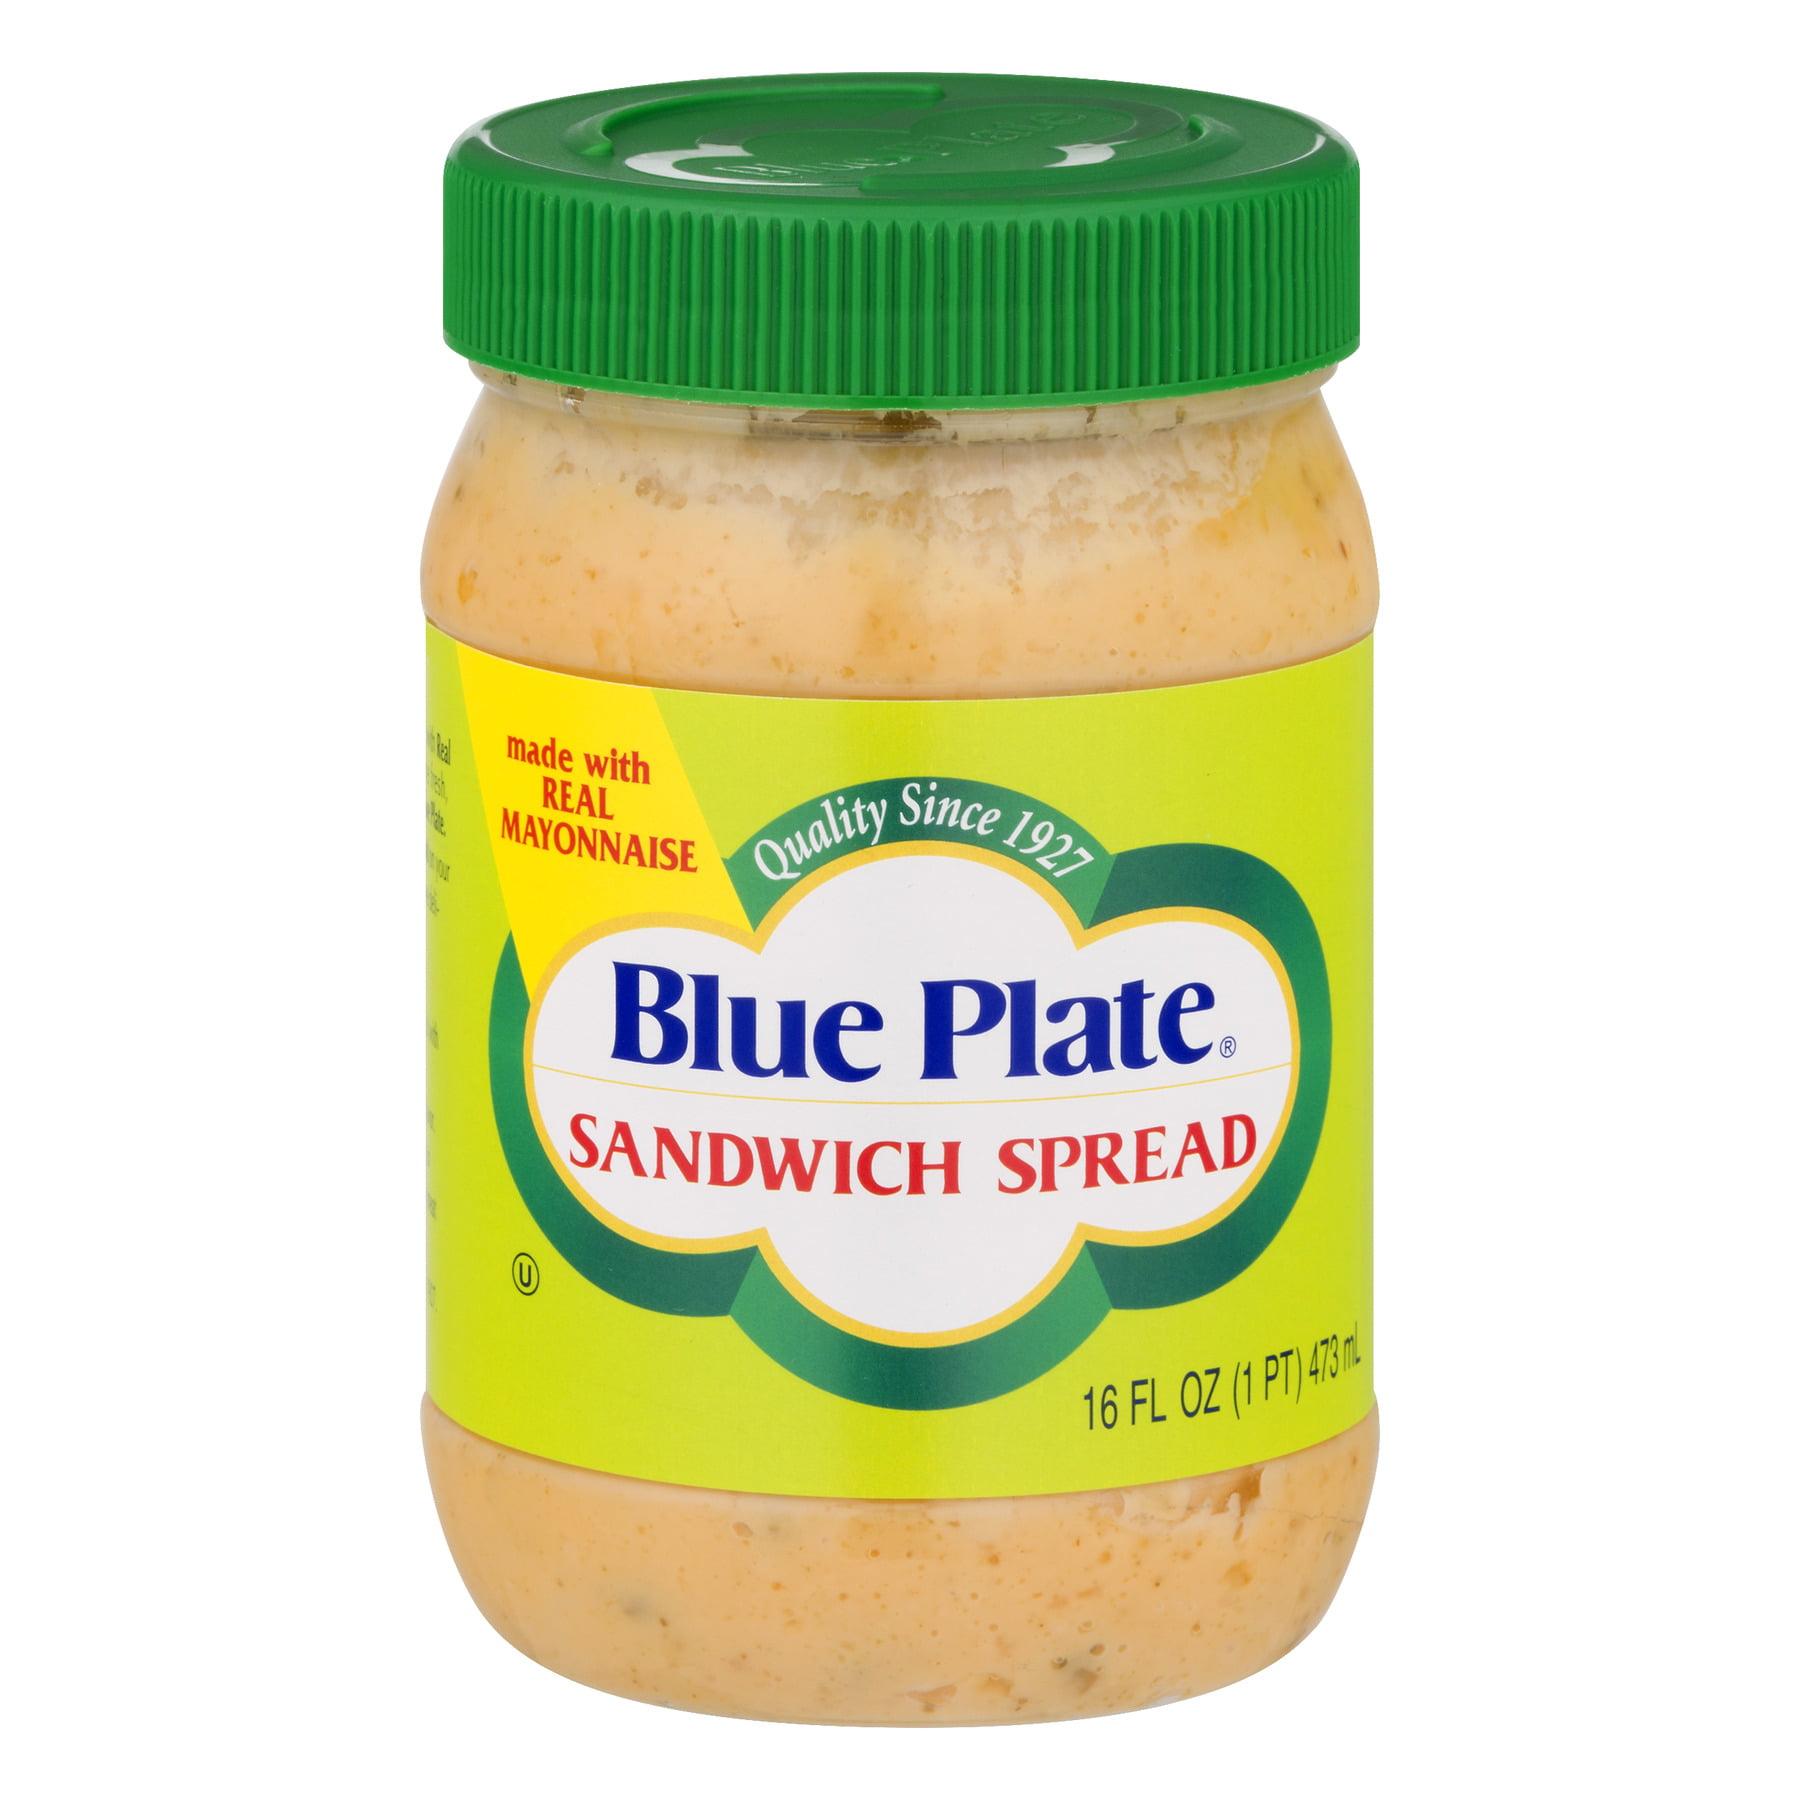 Blue Plate Sandwich Spread, 16.0 FL OZ